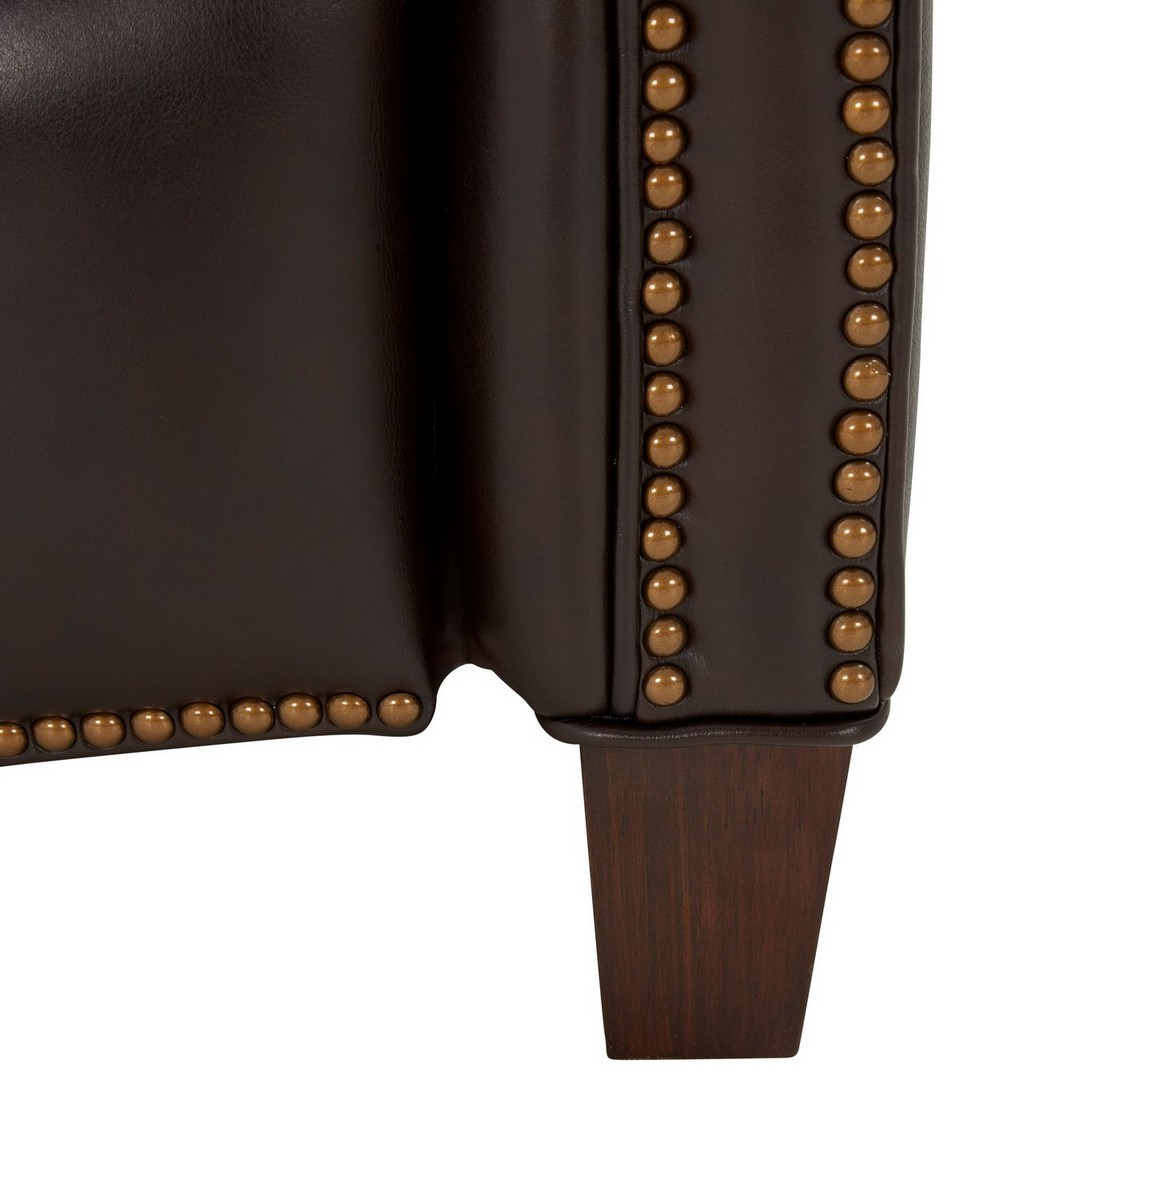 Barcalounger Meade Recliner Chair - Bennington Fudge/All Leather